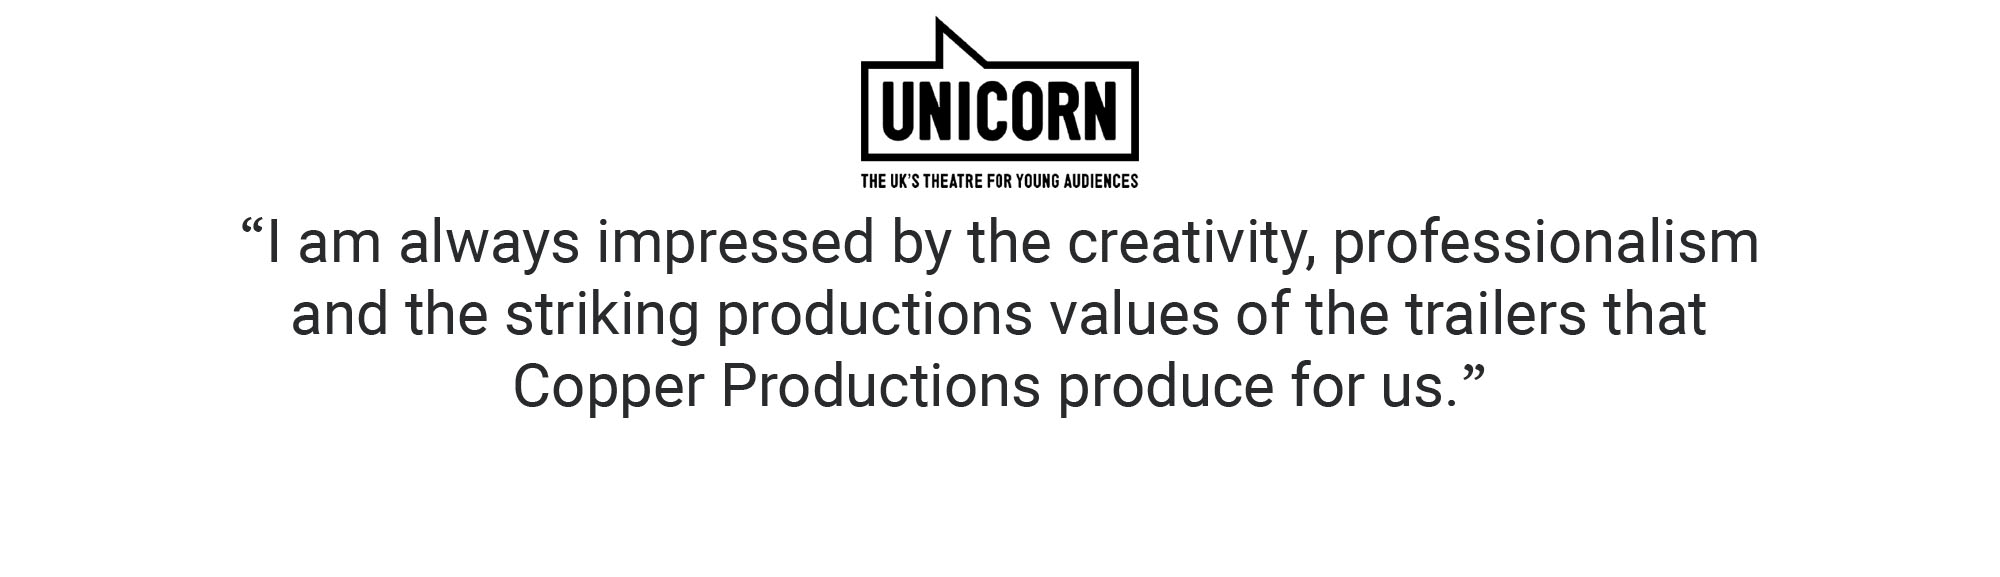 Unicorn Professionalism Creativity Client Testimonial